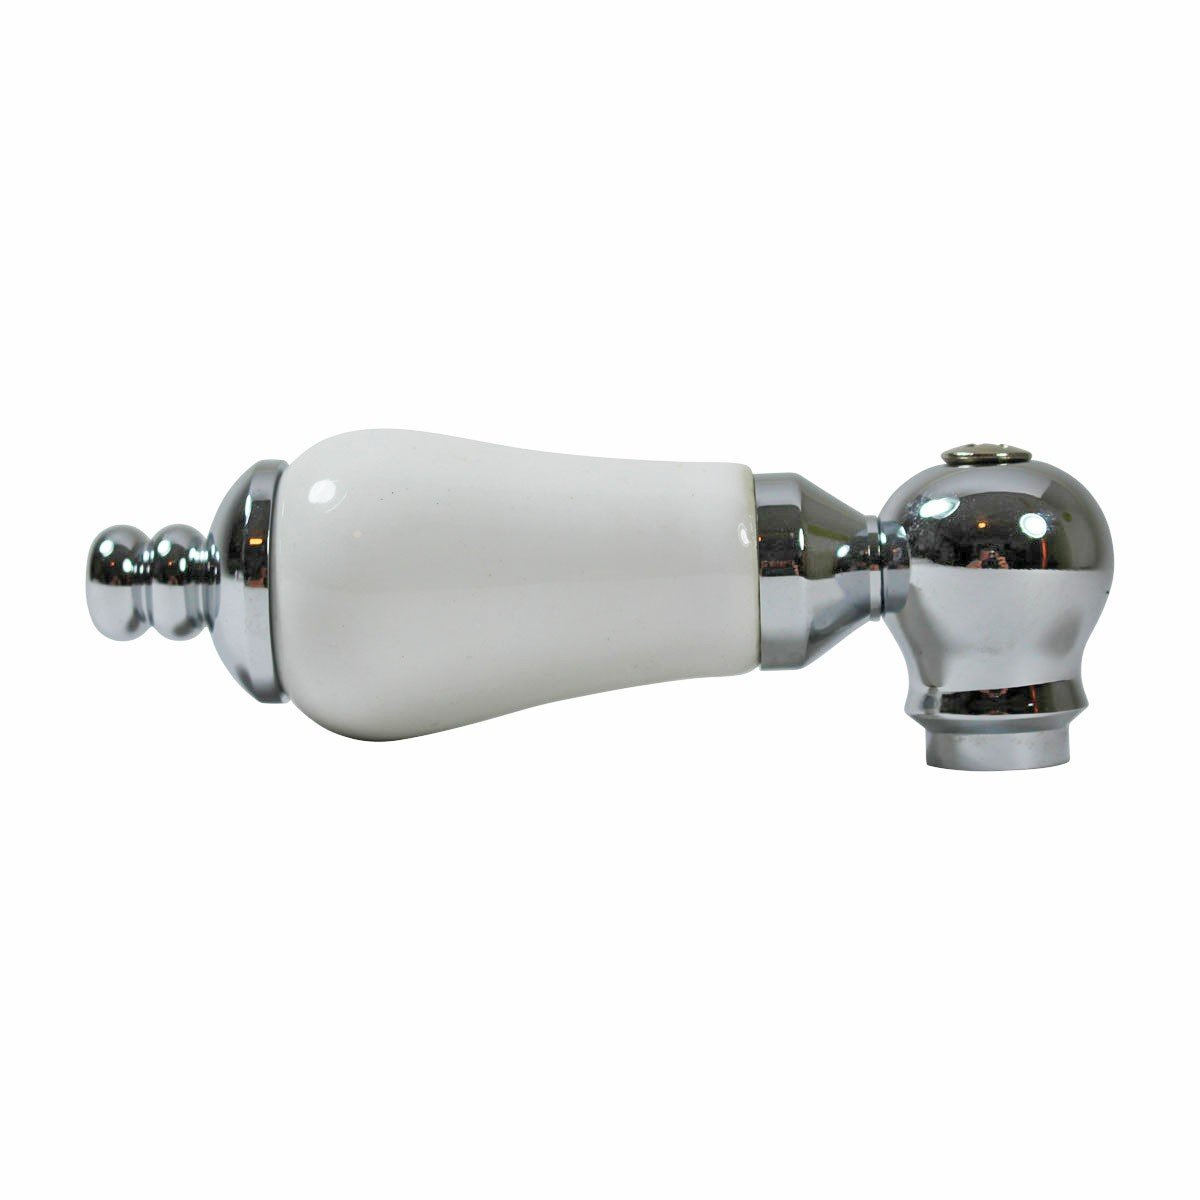 Chrome Faucet Porcelain Lever Handle Replacement Part | Renovator's Supply hot sale 2017